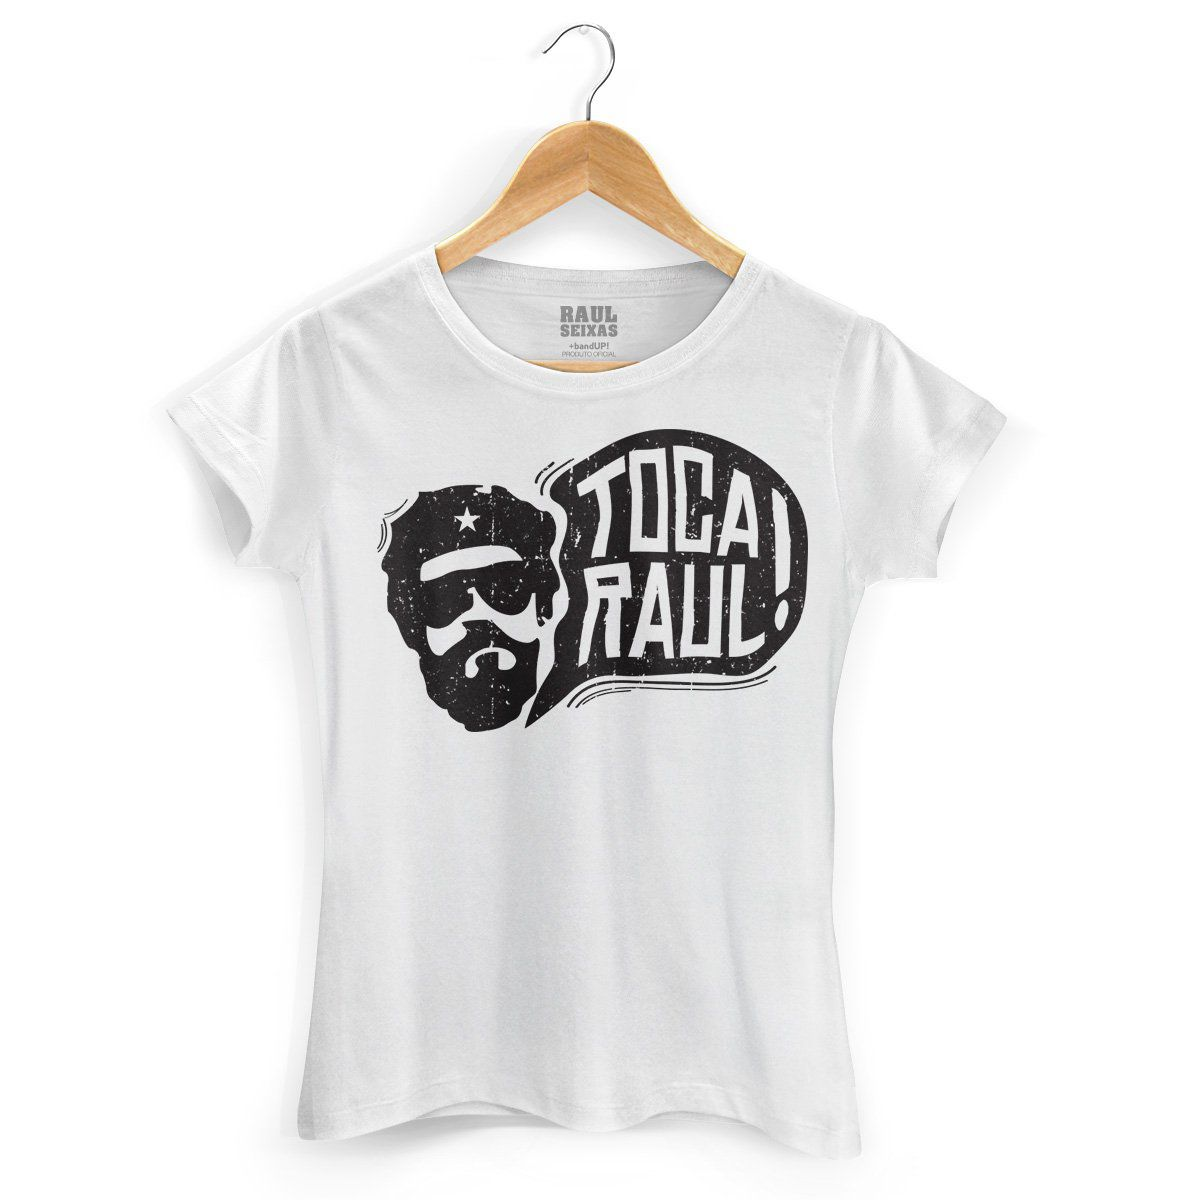 Camiseta Feminina Raul Seixas Toca Raul  - bandUP Store Marketplace